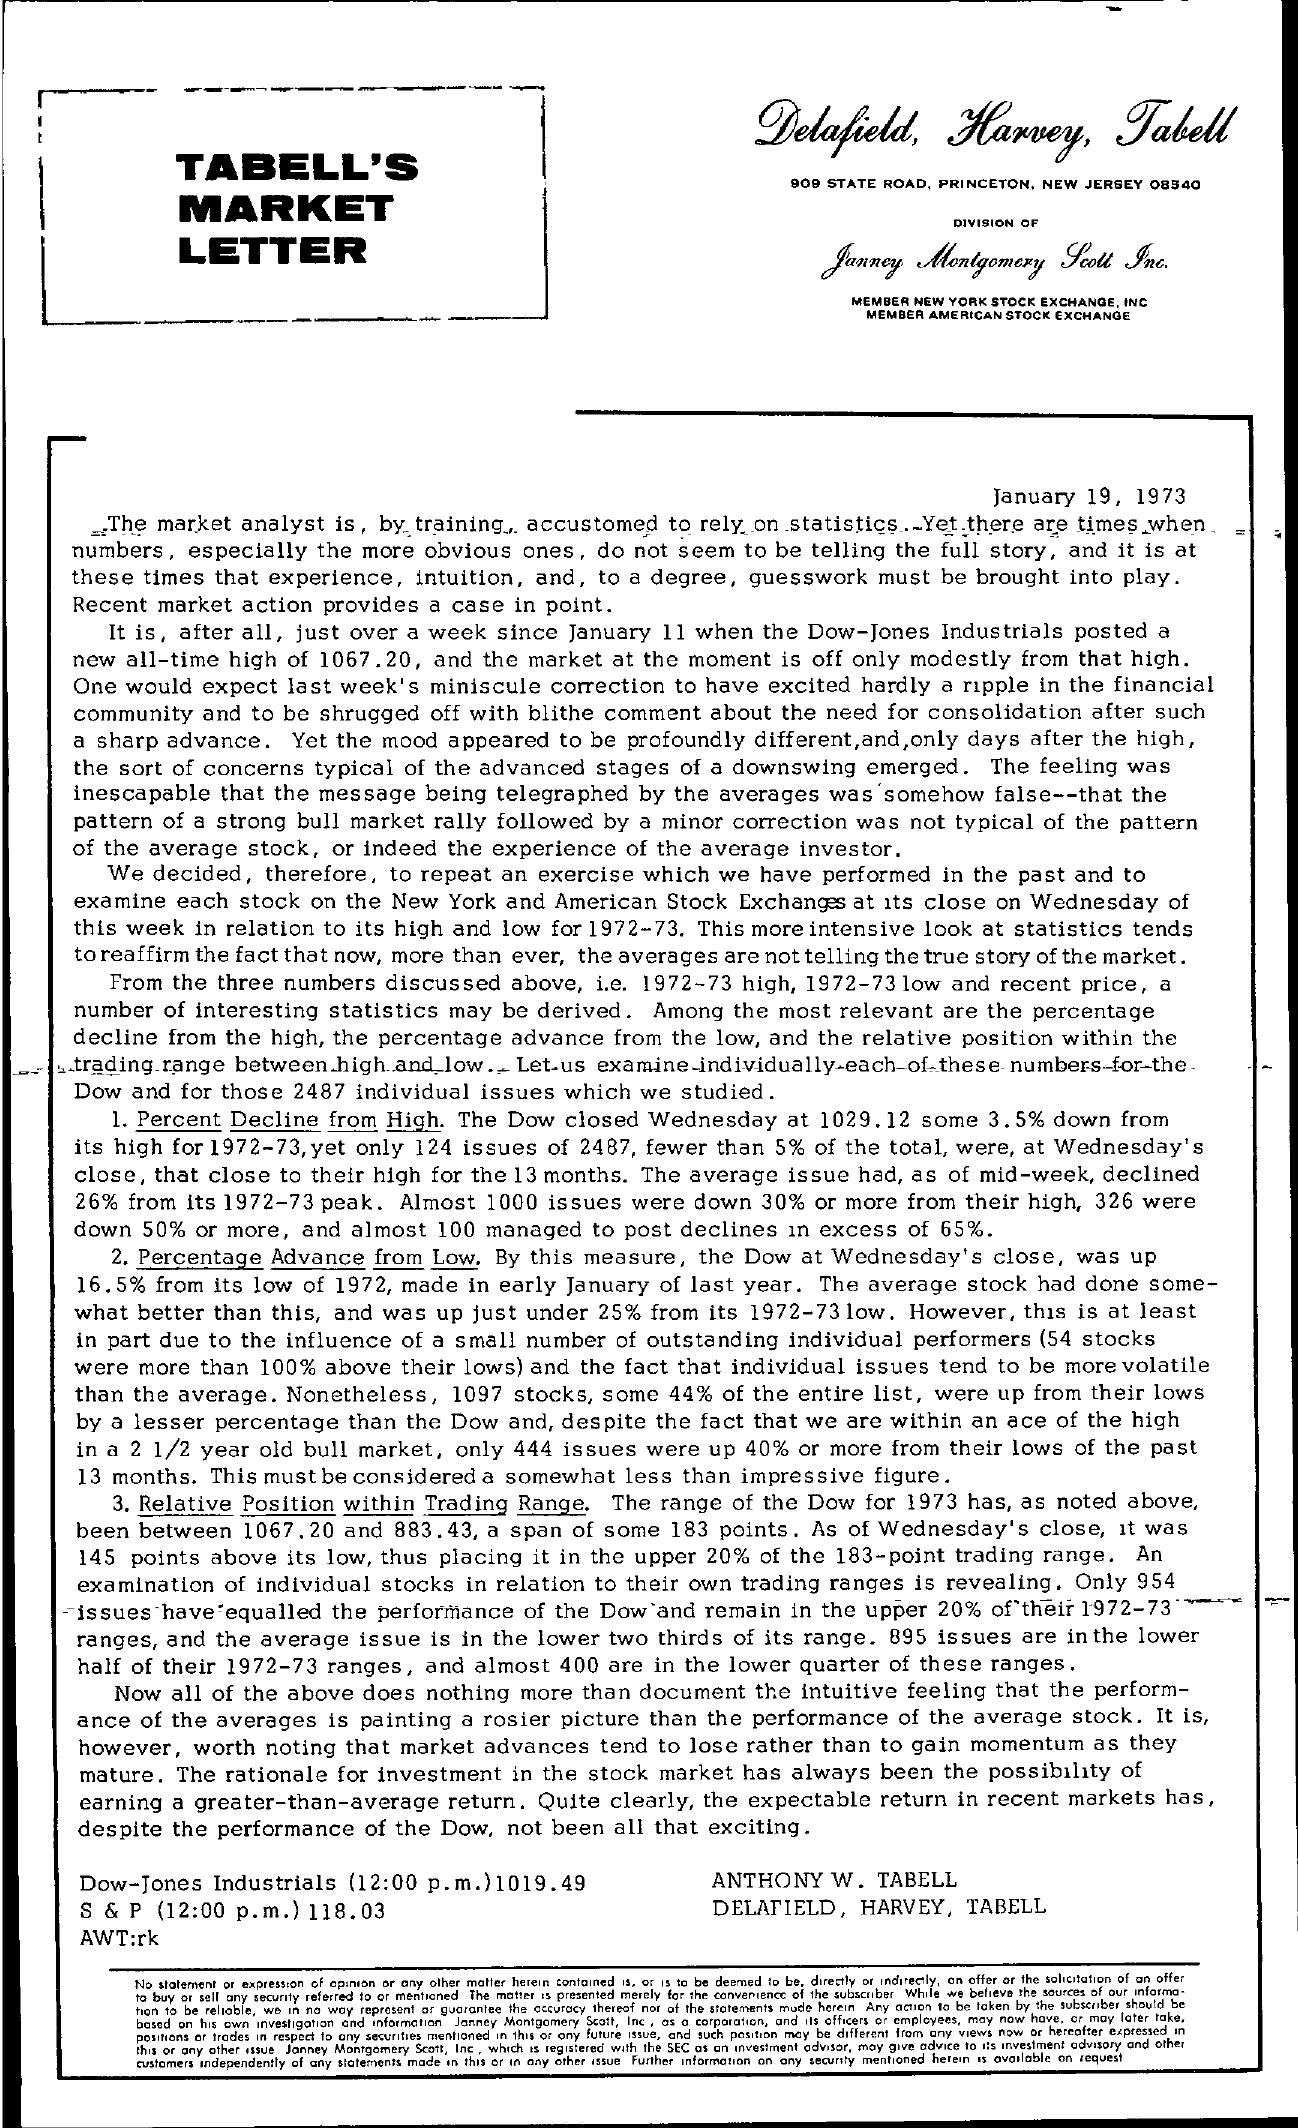 Tabell's Market Letter - January 19, 1973